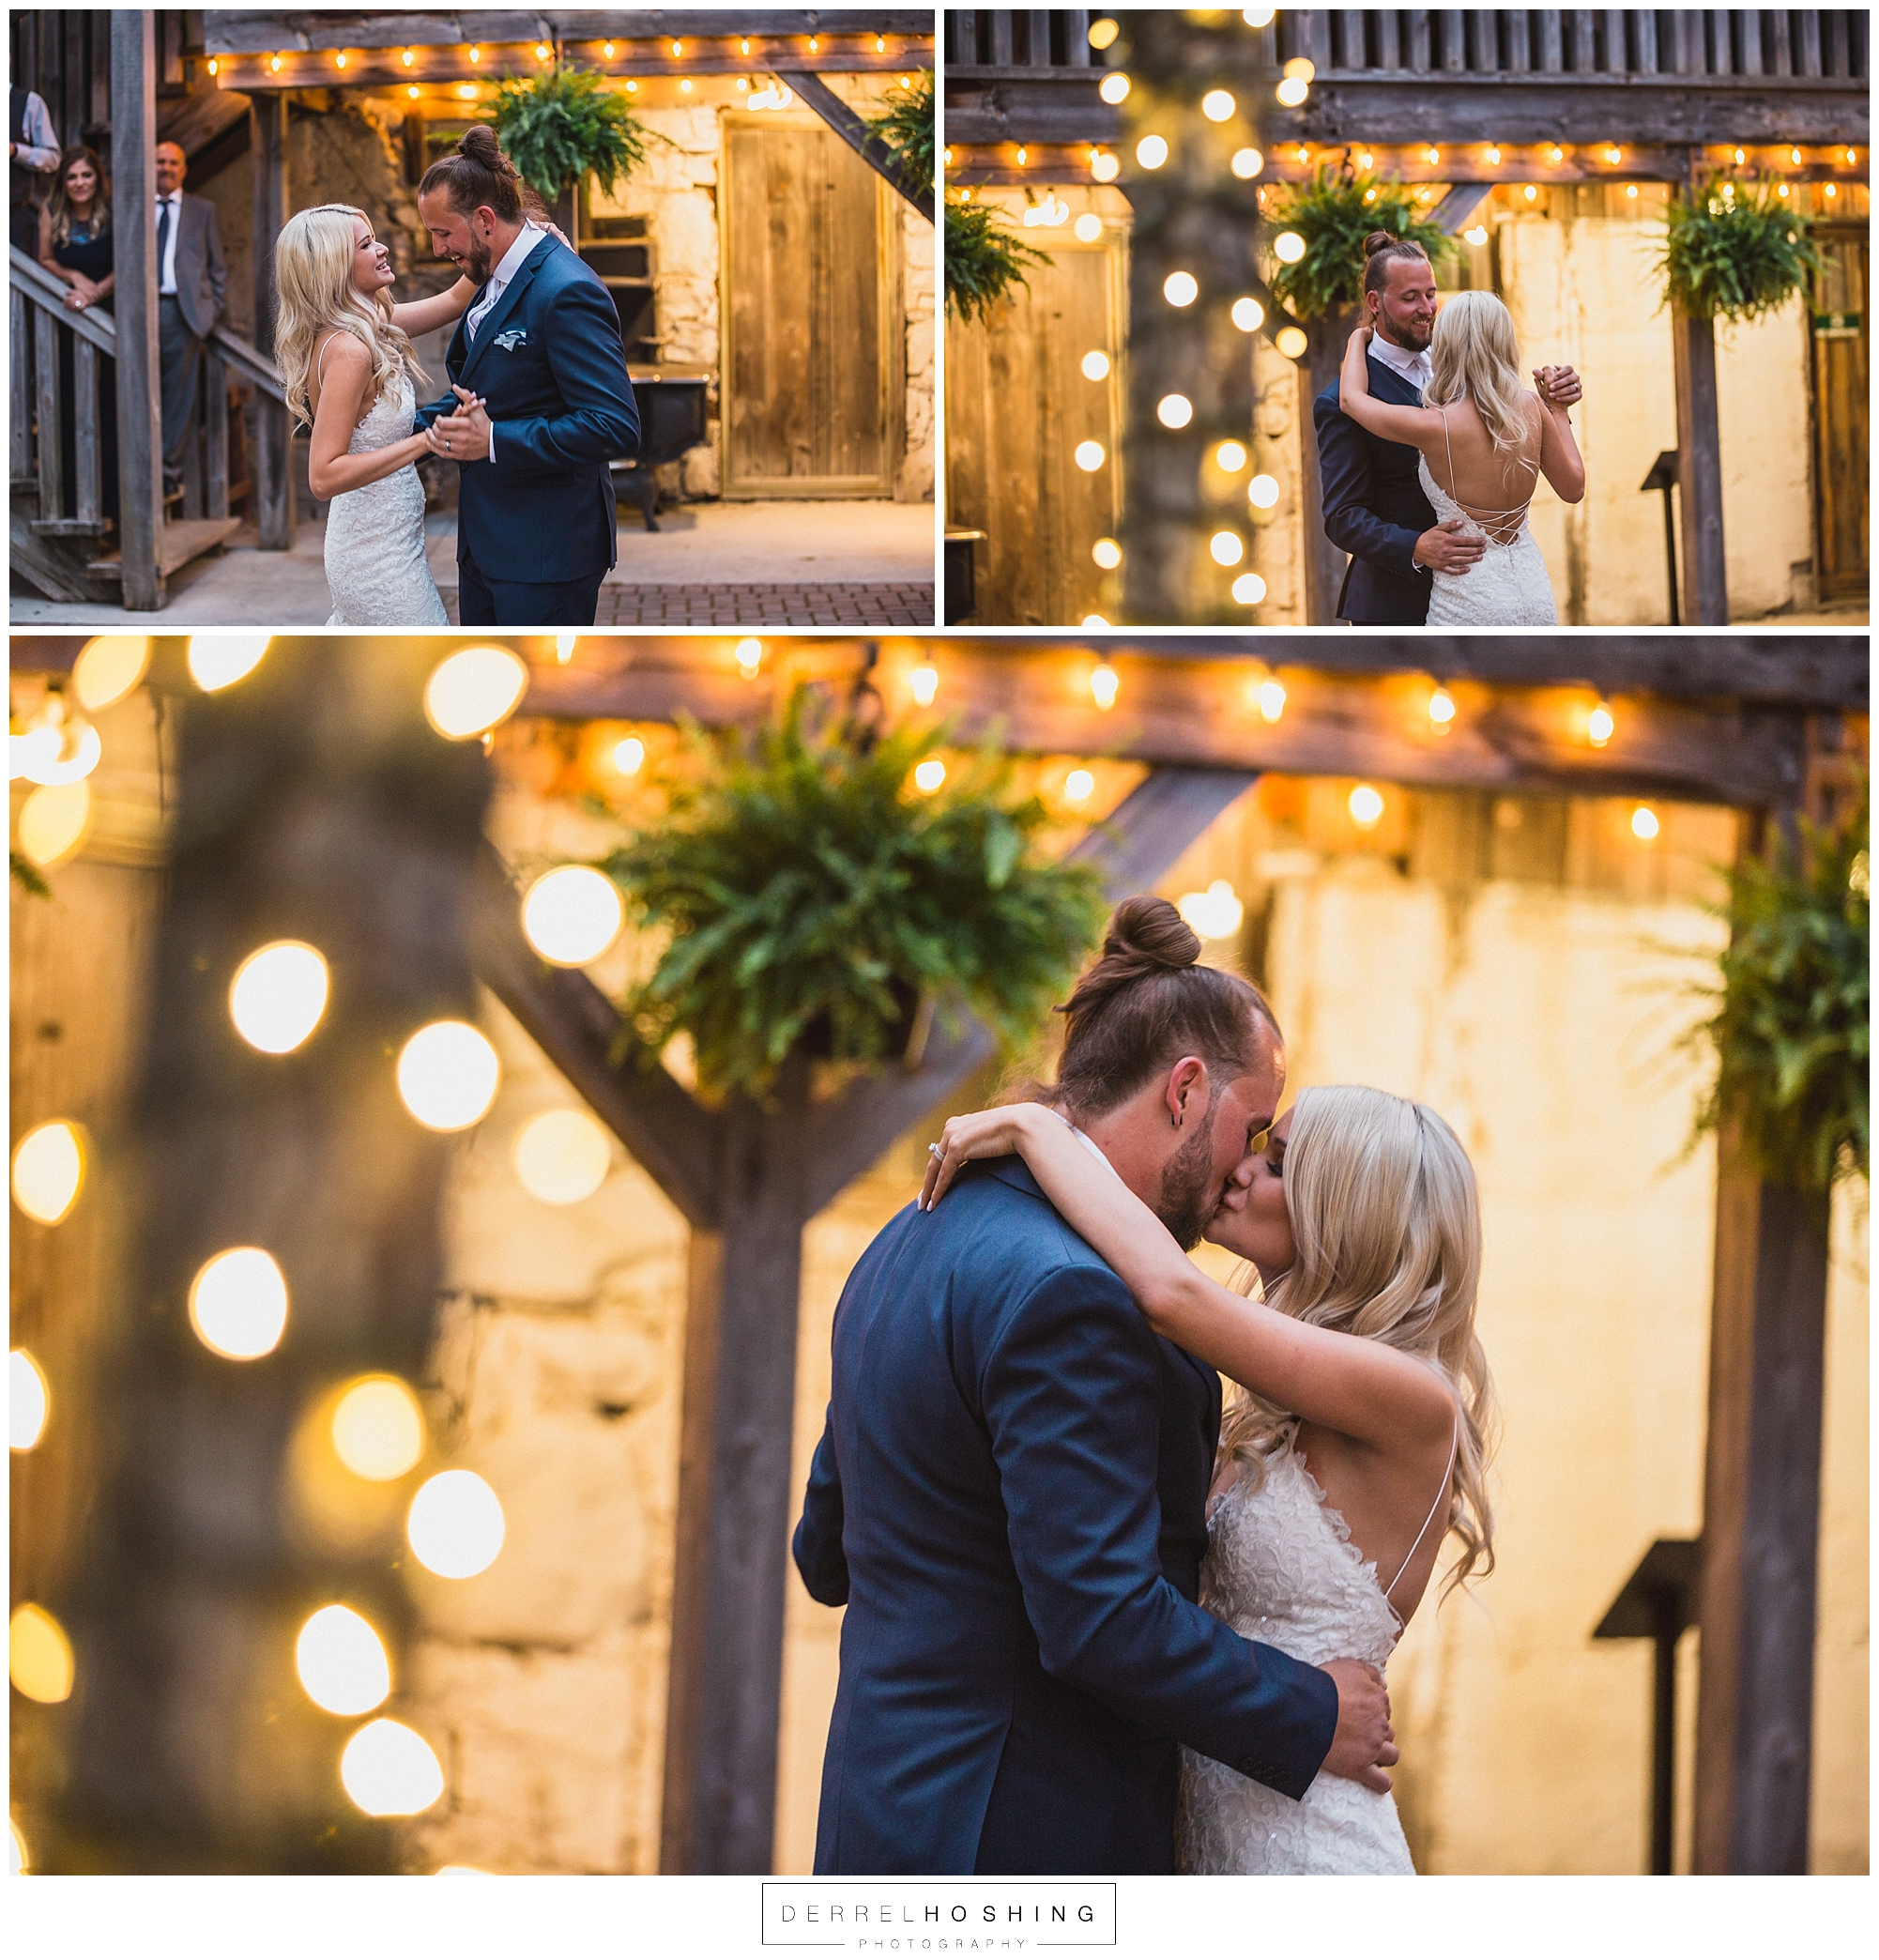 Belcroft-Estates-&-Event-Centre-Wedding-Innisfil-Ontario-0034.jpg